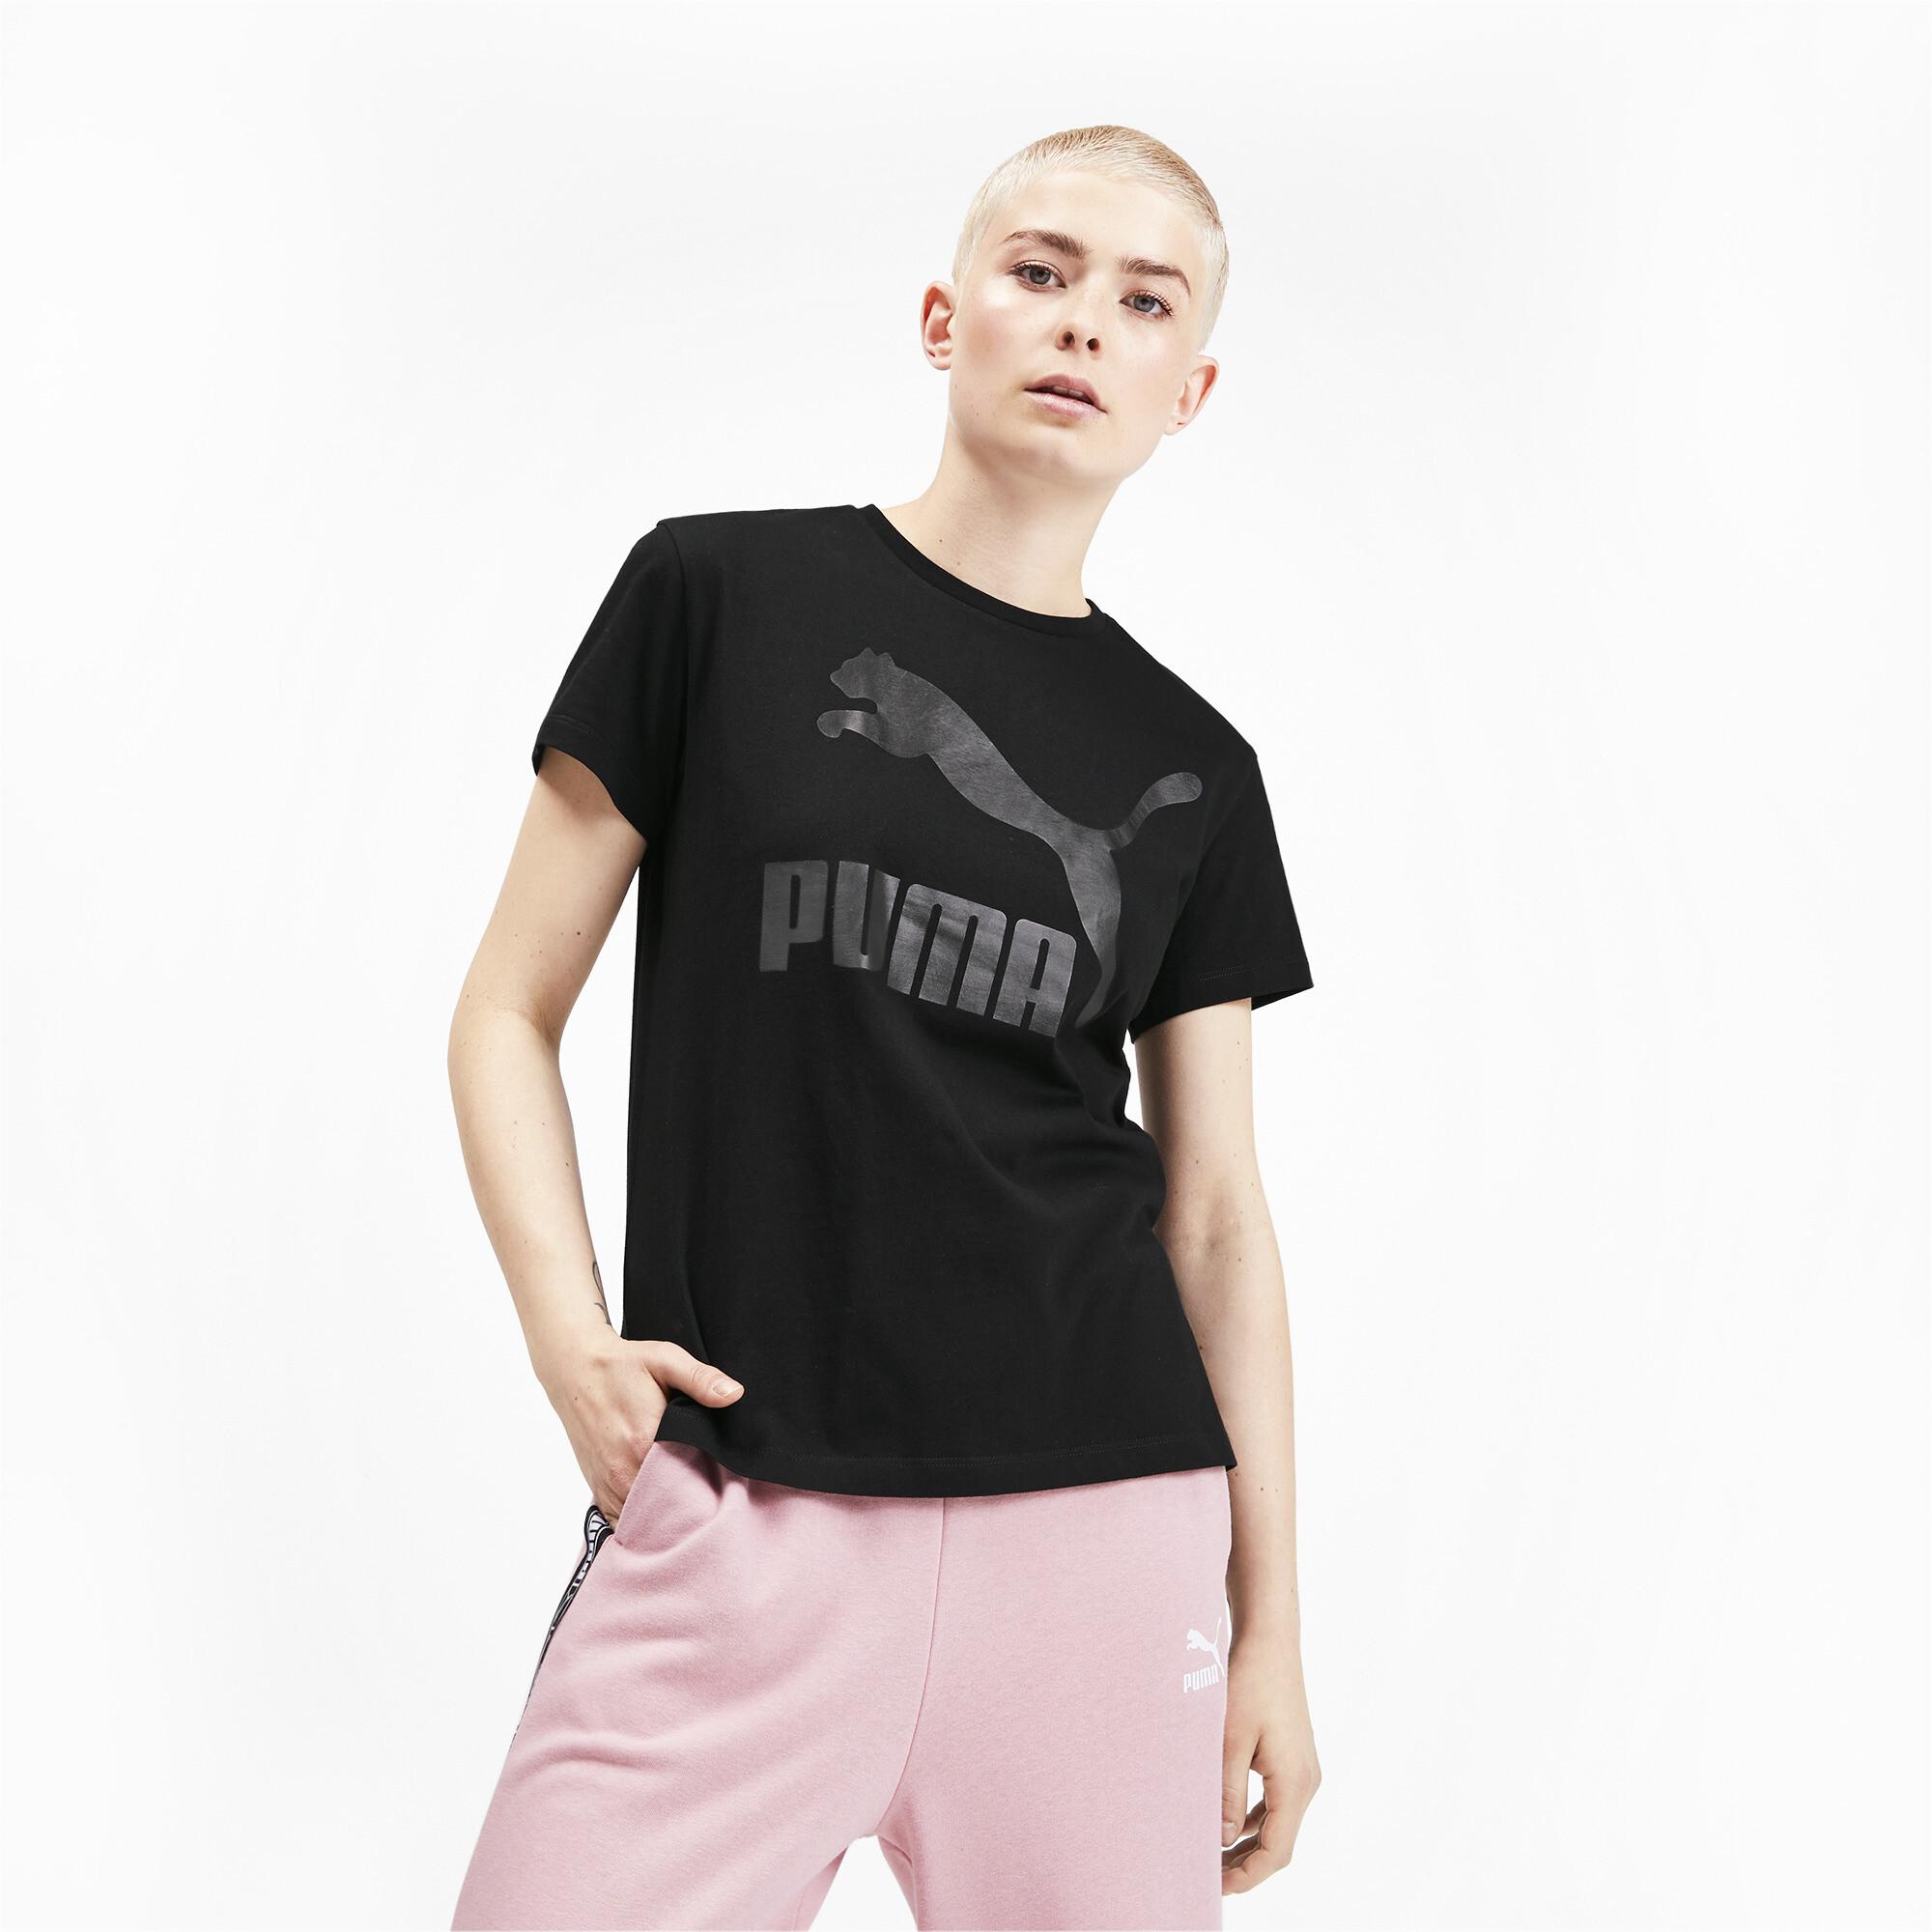 PUMA-Classics-Women-039-s-Logo-Tee-Women-Tee-Sport-Classics thumbnail 5